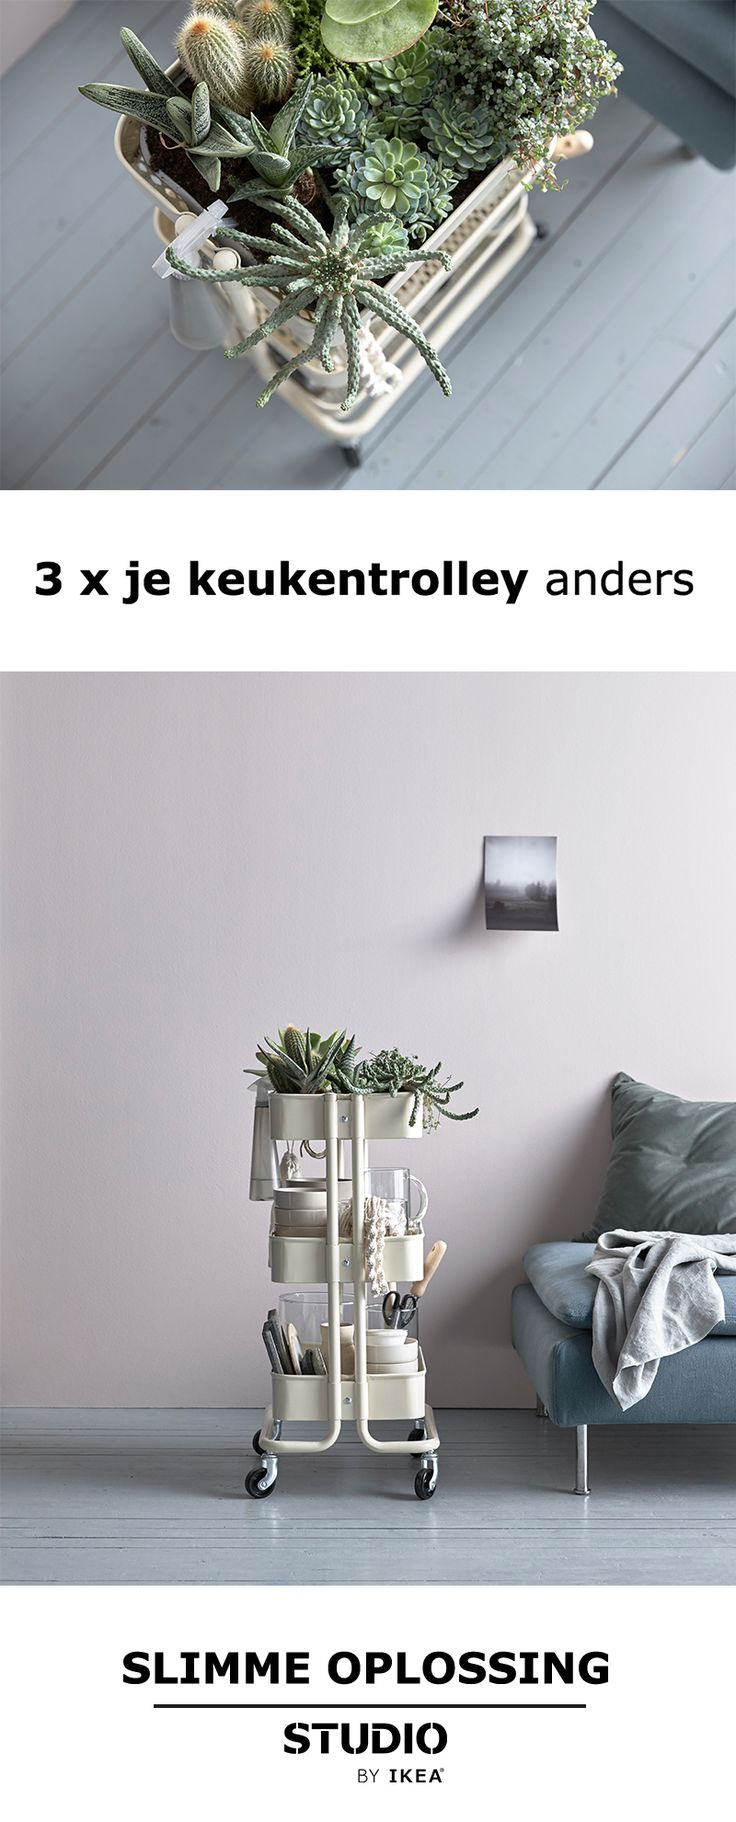 Ikea Badkamer Trolley ~   IKEA RASKOG on Pinterest  Utility cart, Ikea raskog and Ikea cart